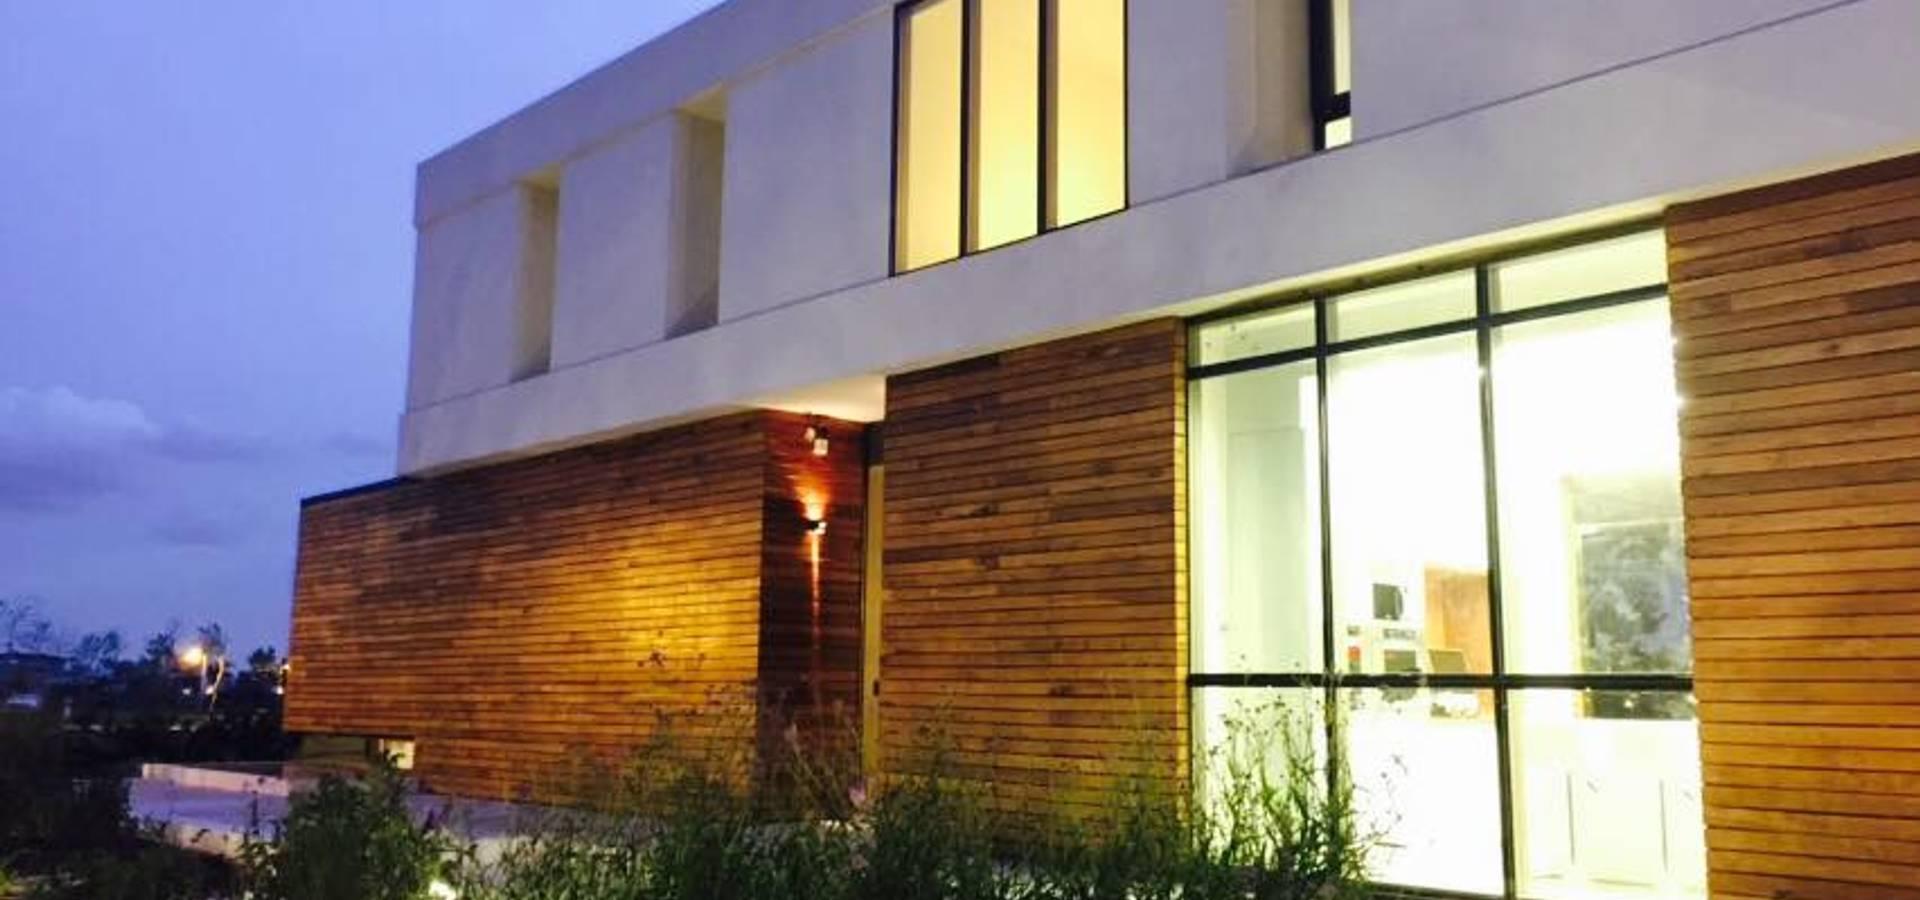 Israel & Teper arquitectos